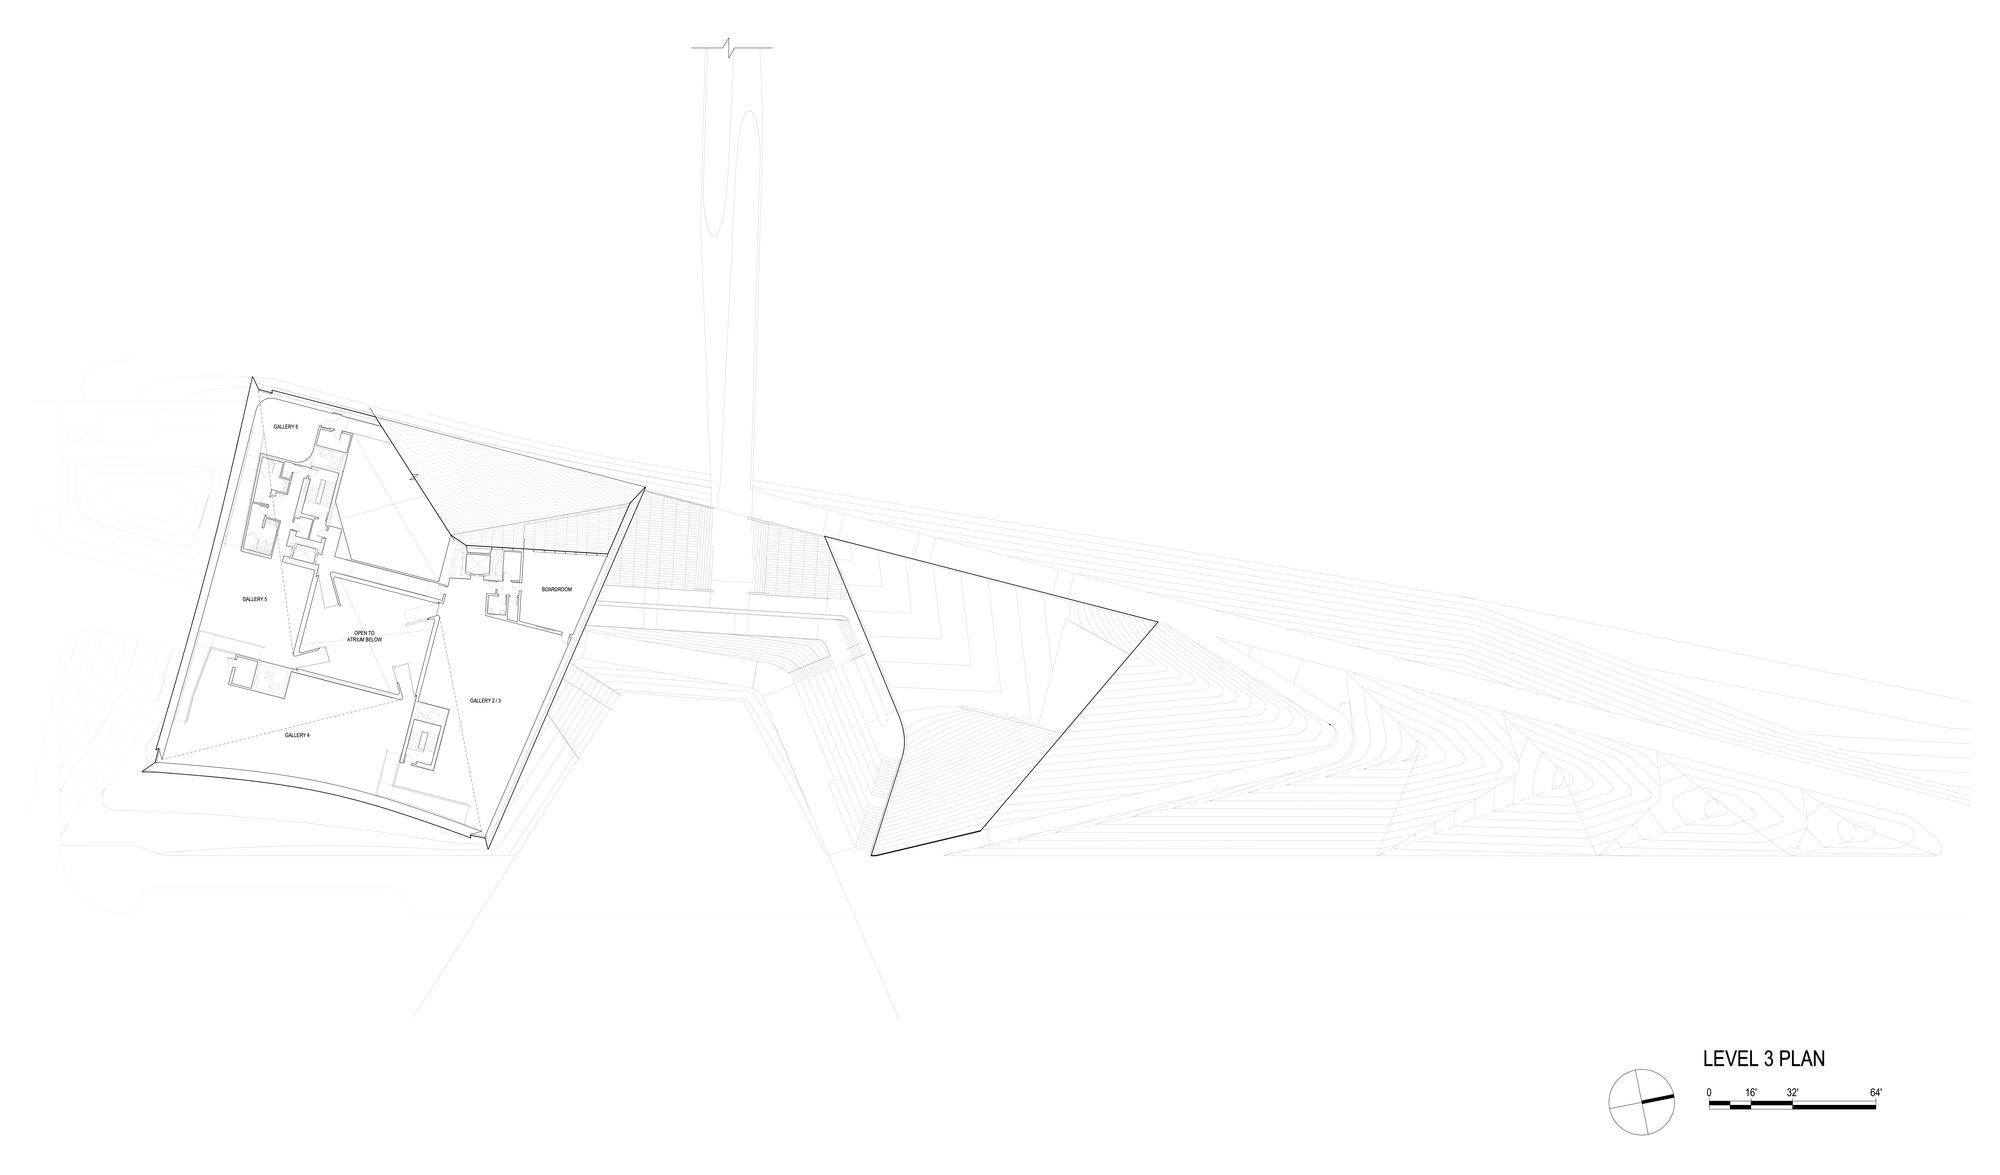 m3 _USOPM_Plans_2.jpg